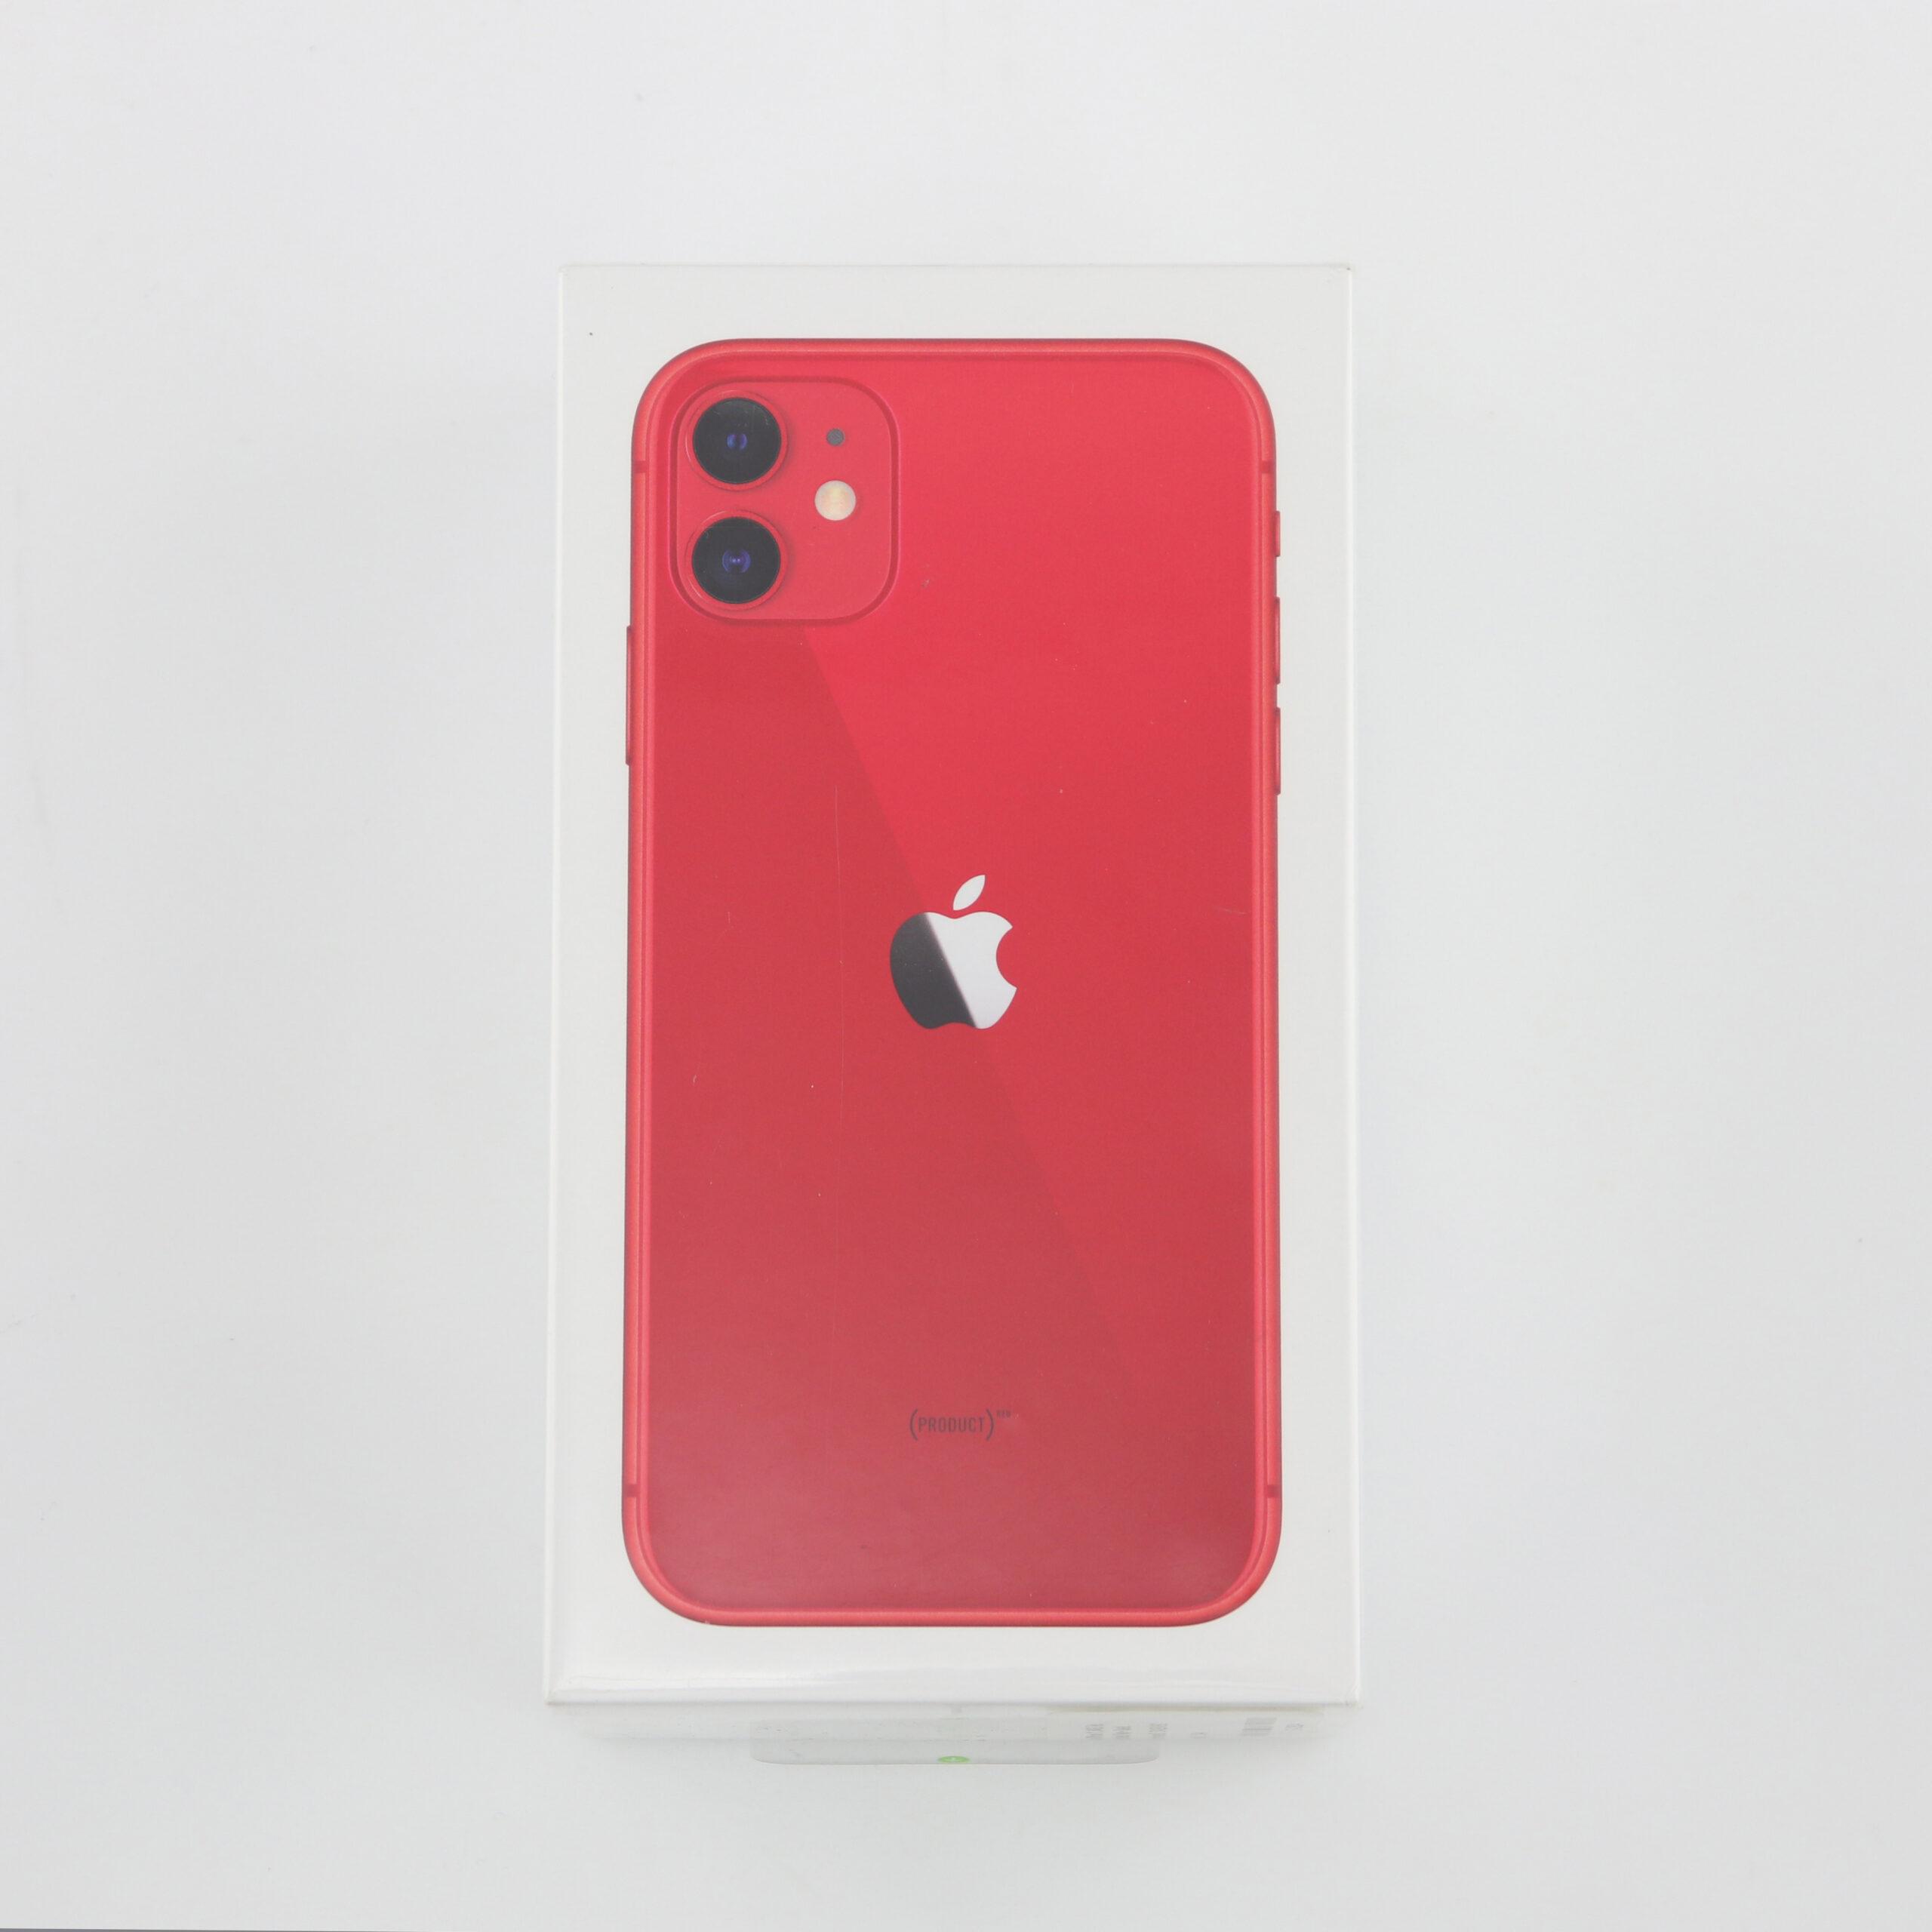 1 x Apple iPhone 11 (Unlocked) 64GB Red (BRAND NEW)